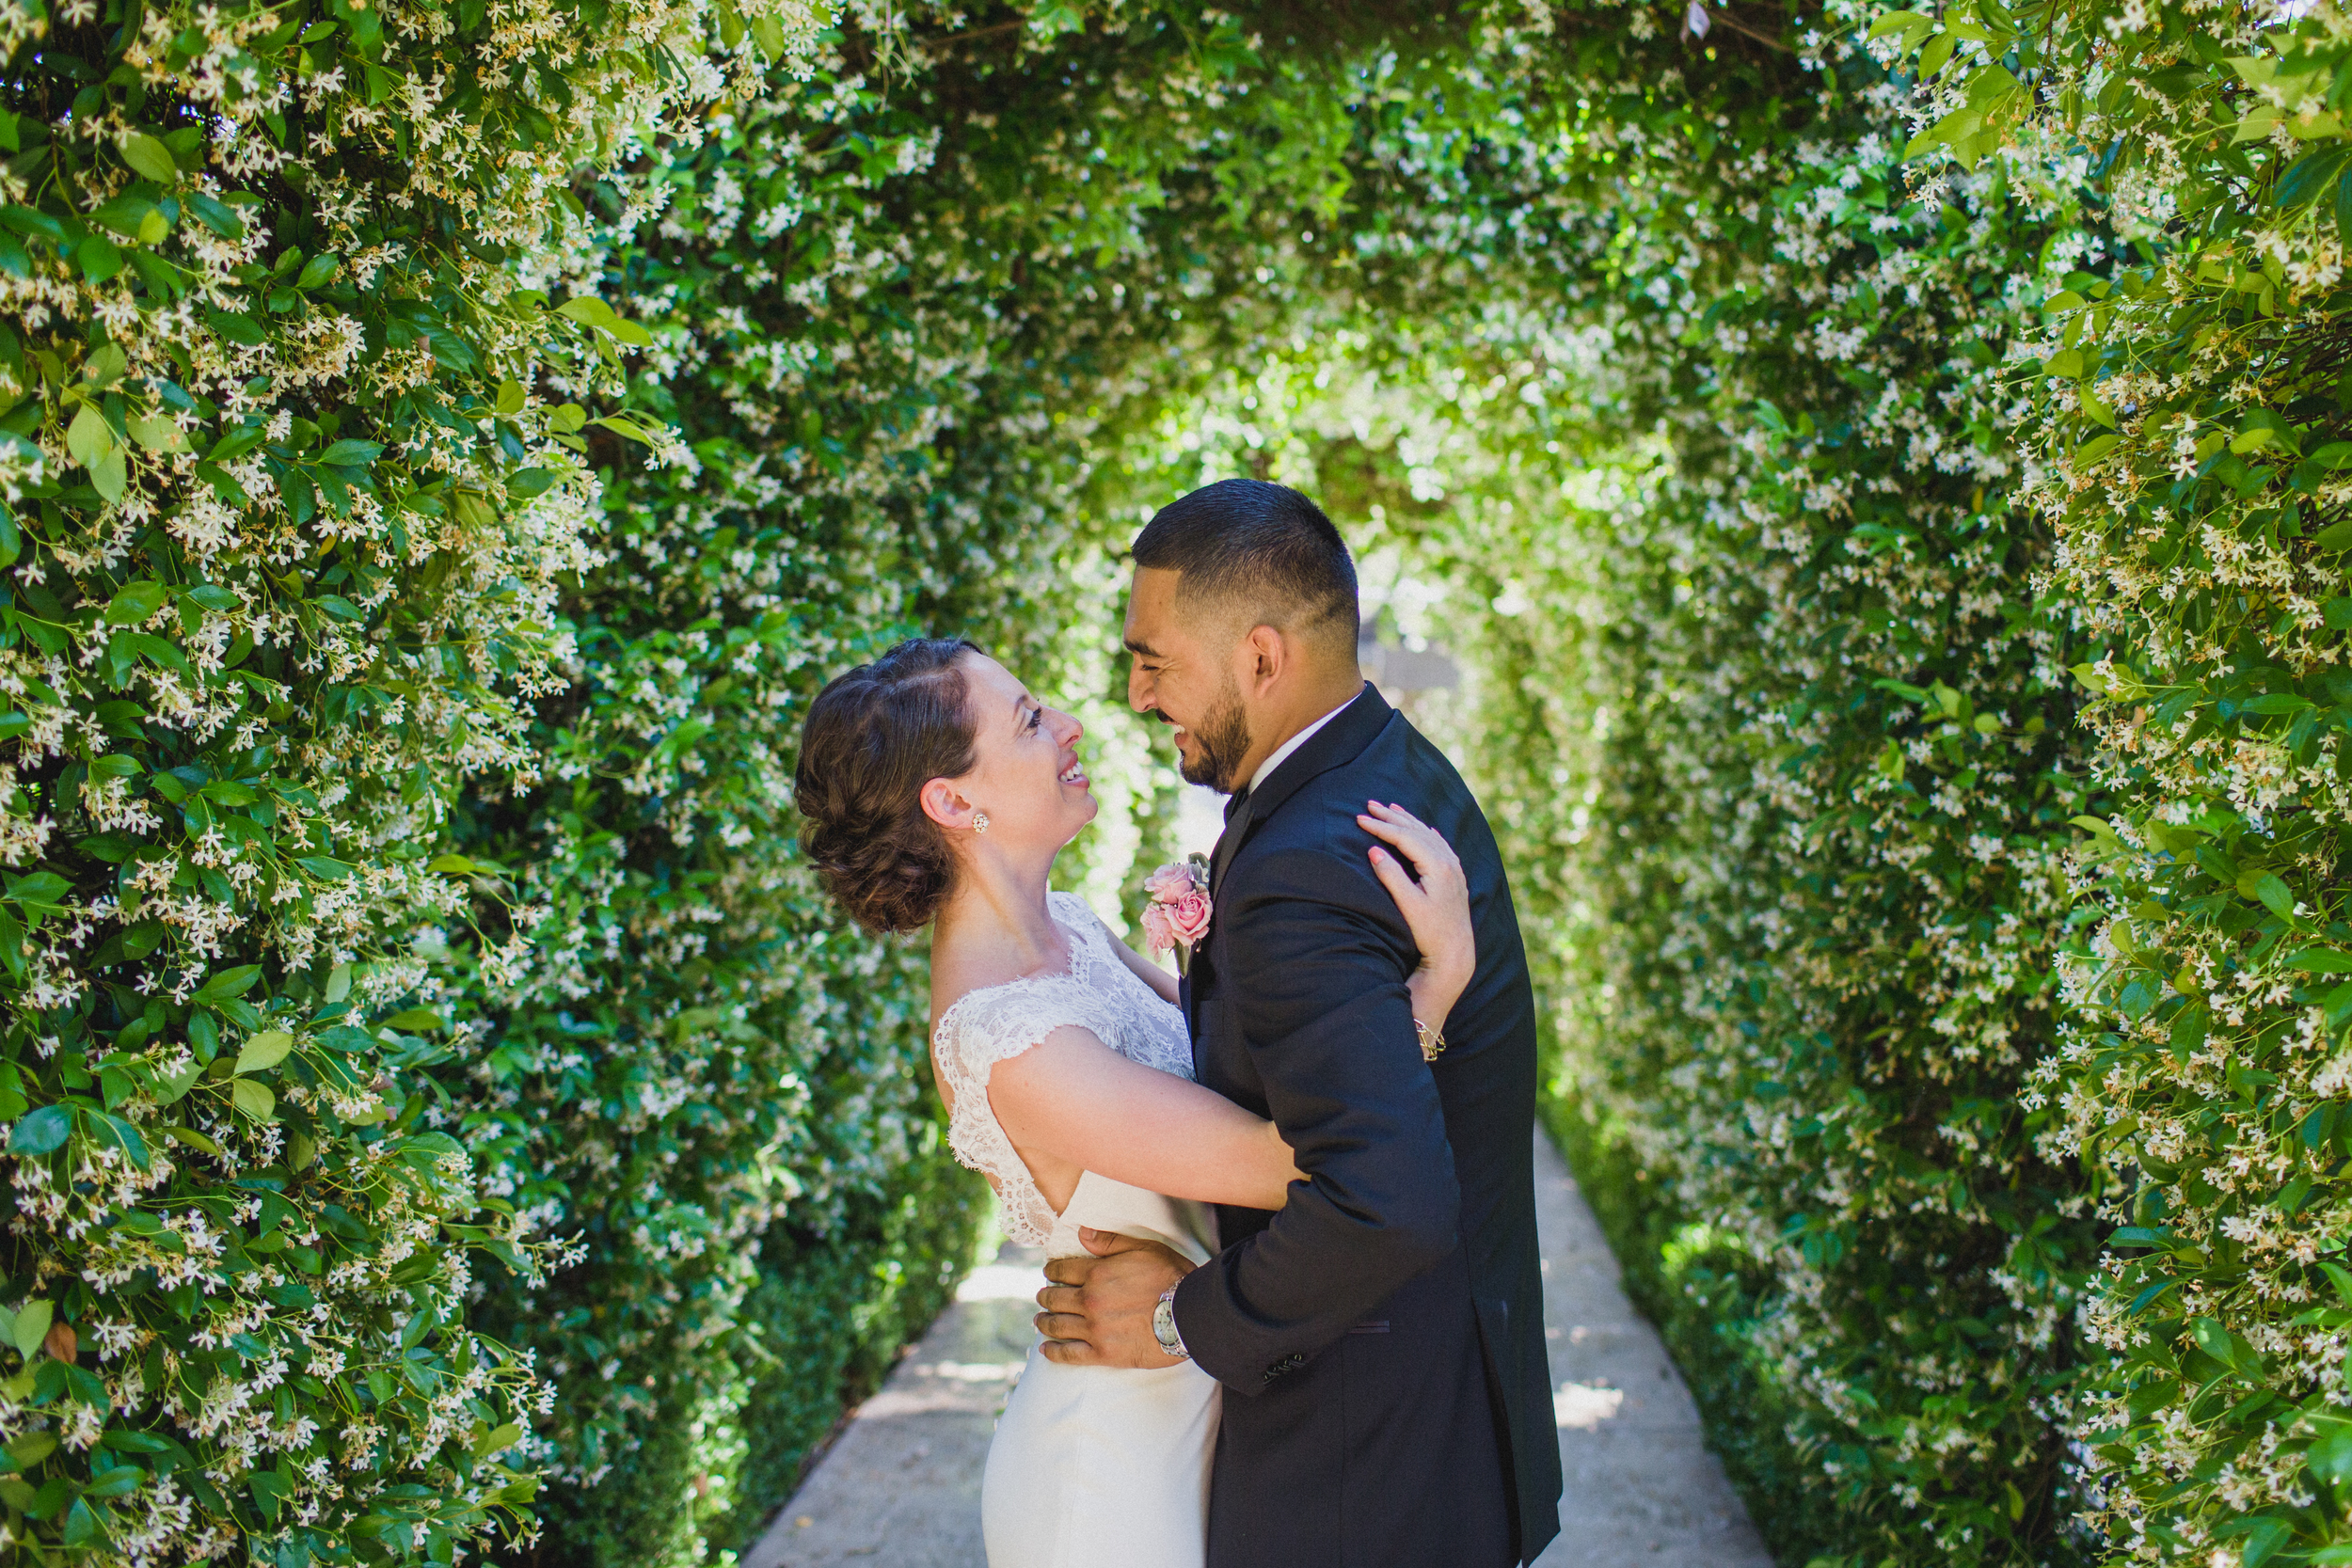 028 Hartley Botanica Wedding Photography Cotton Love Studios.jpg